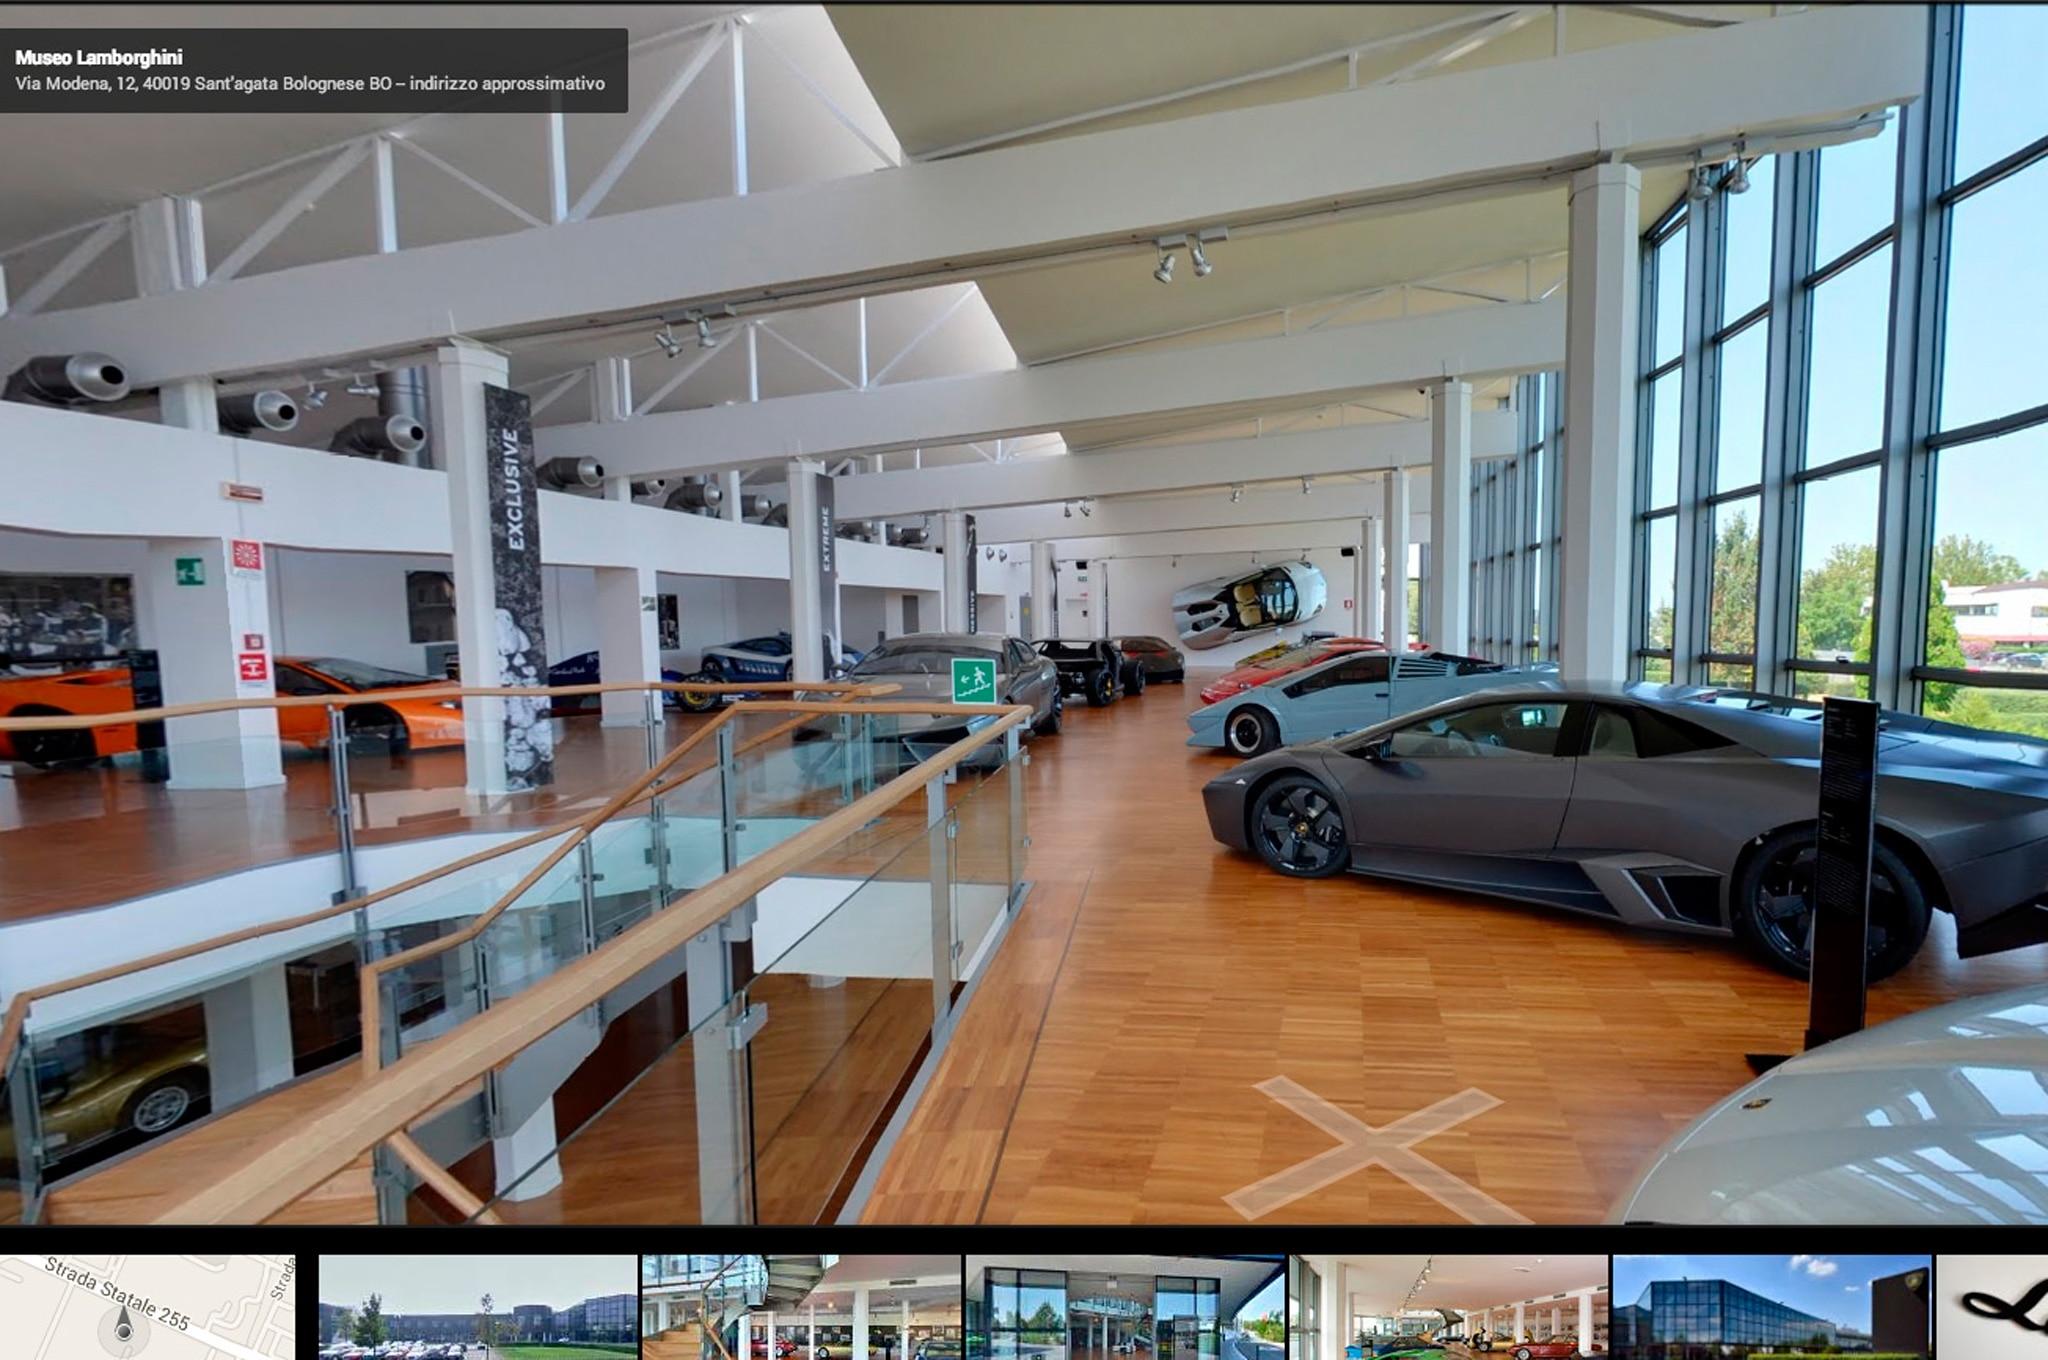 Lamborghini Museum On Google Street View Second Floor View1